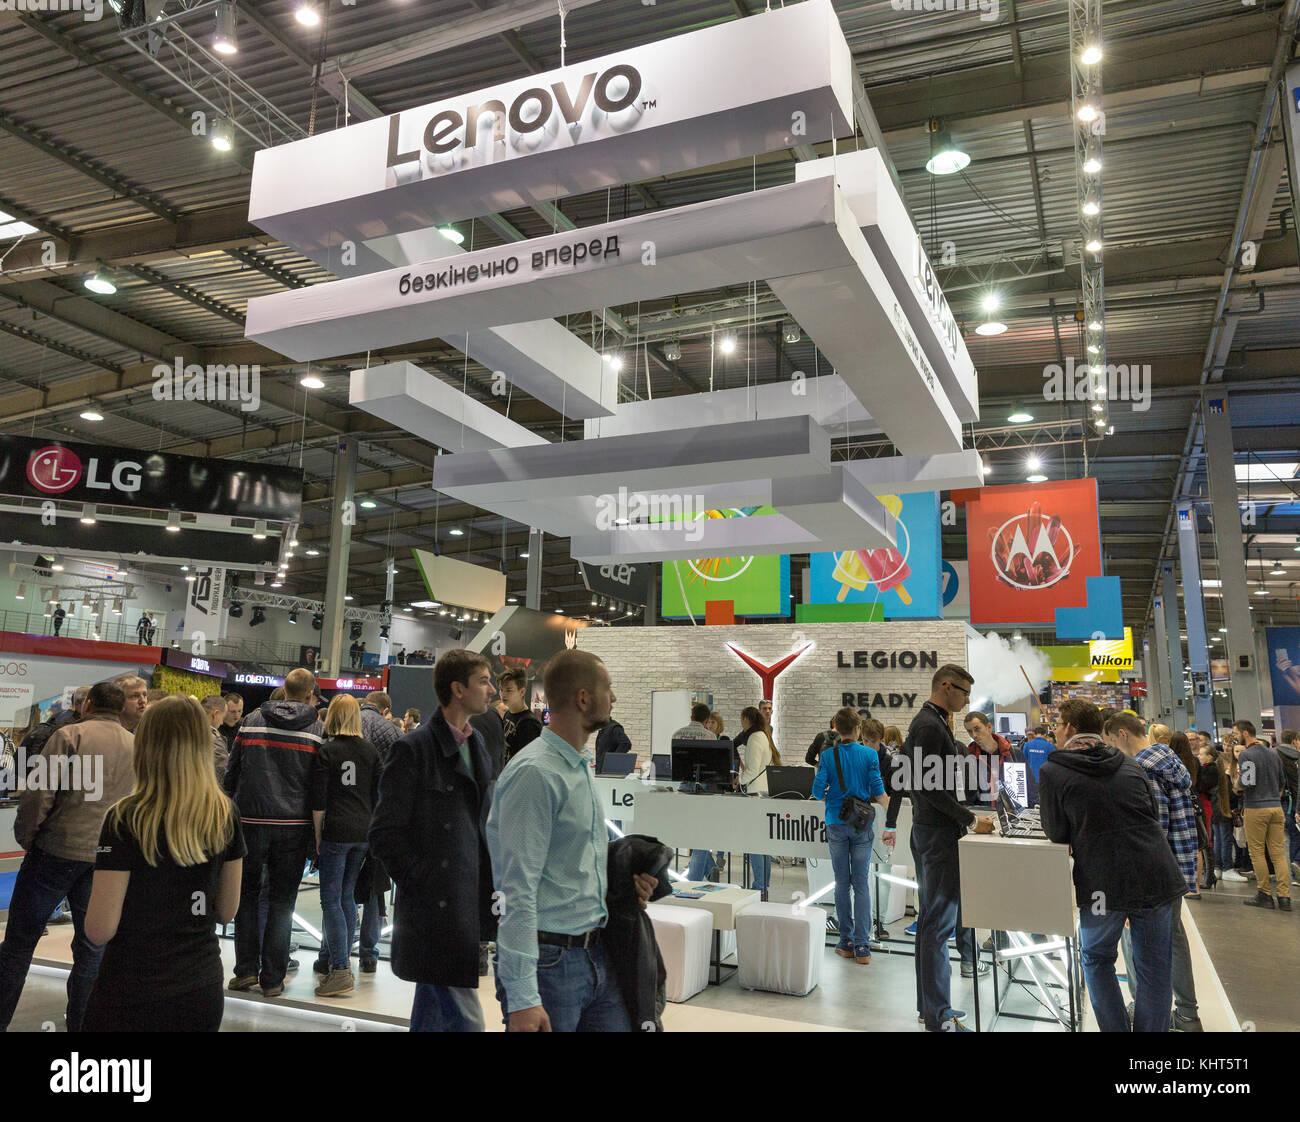 Lenovo: 2018 Brand Report Card